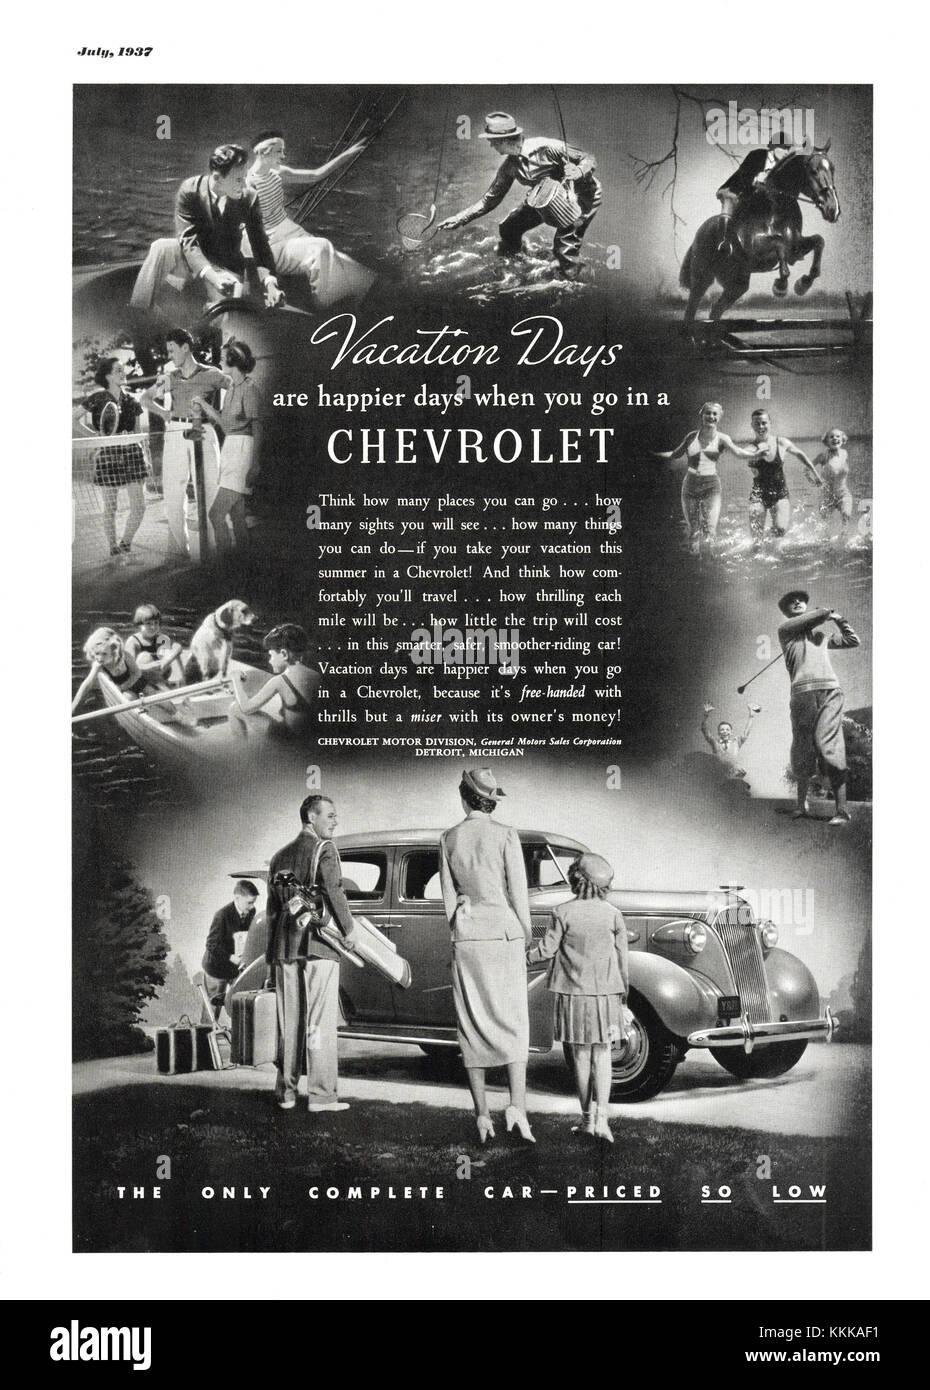 1937 U.S. Magazine Chevrolet Advert - Stock Image